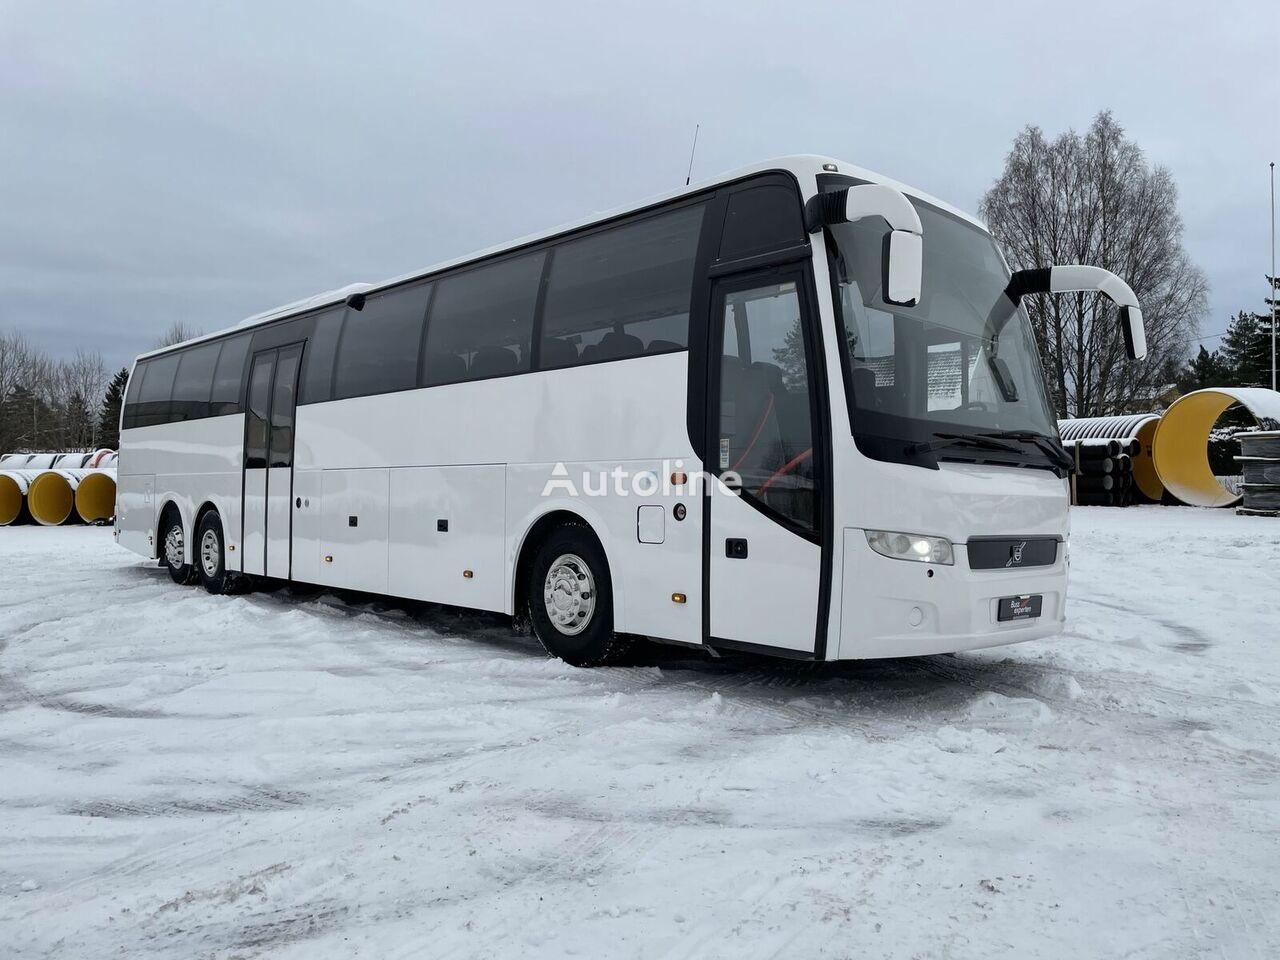 VOLVO B11R 9700H turistbus